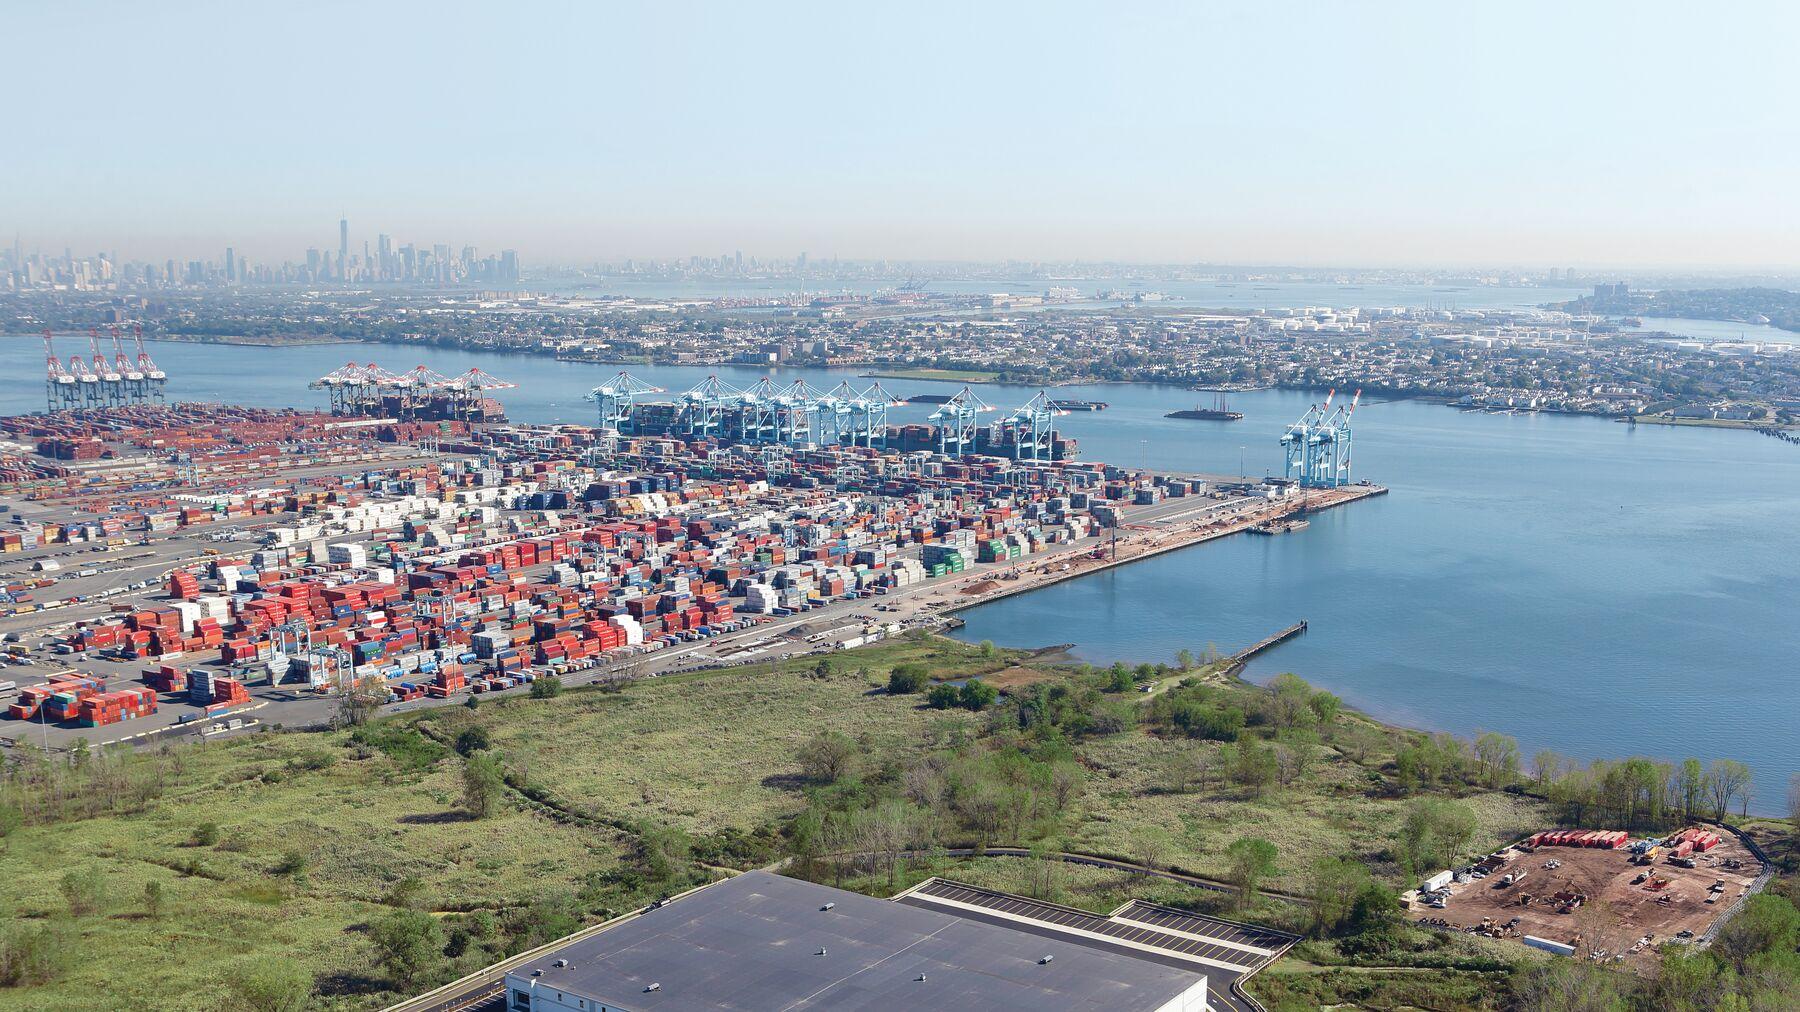 DPM-Elizabeth-Seaport-Bldg-B_1.jpg